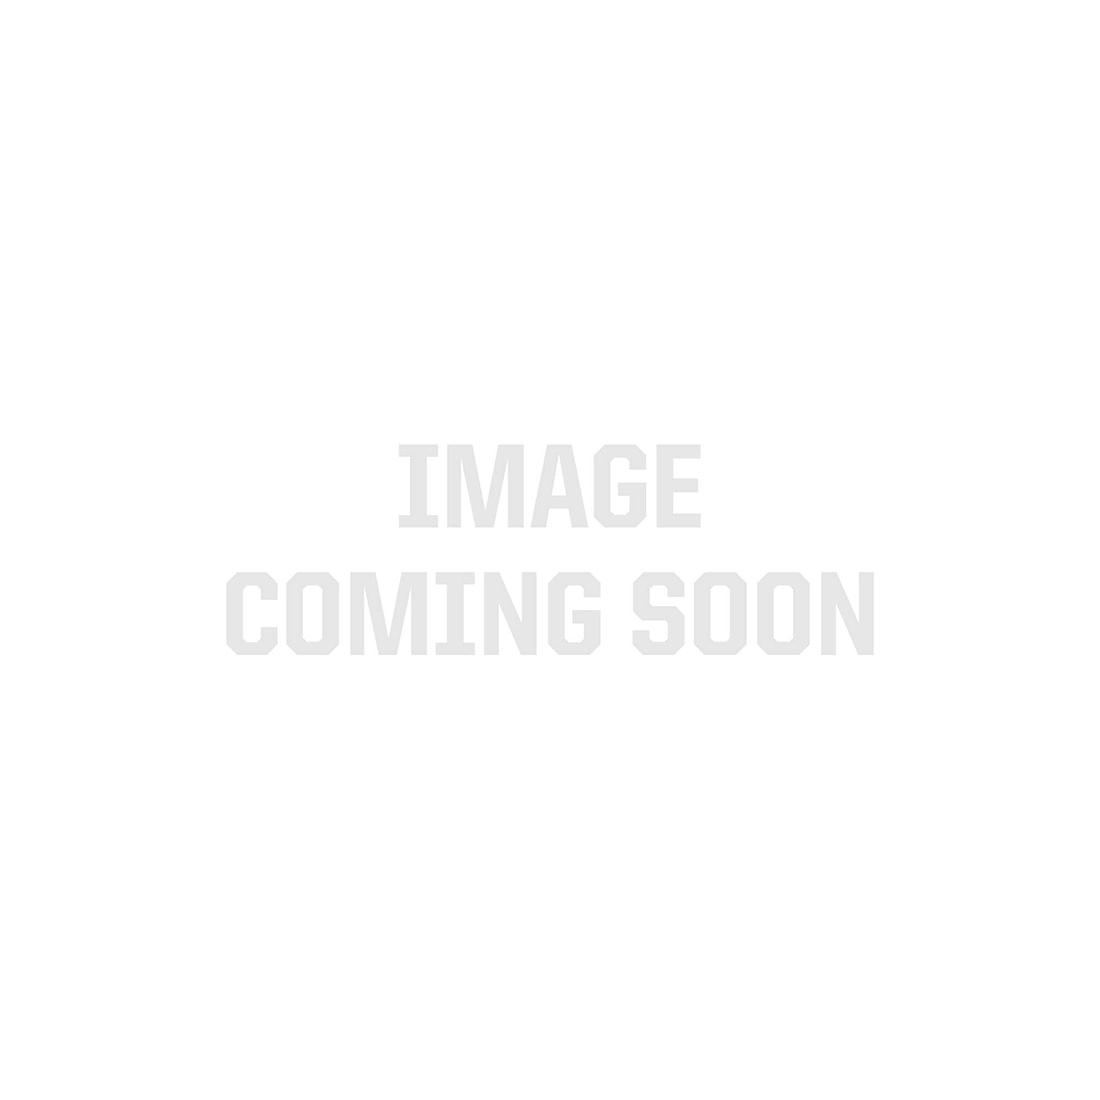 MaxLite MaxLED full cutoff LED Wall Pack (Dark Sky), 40 Watts Bronze or White